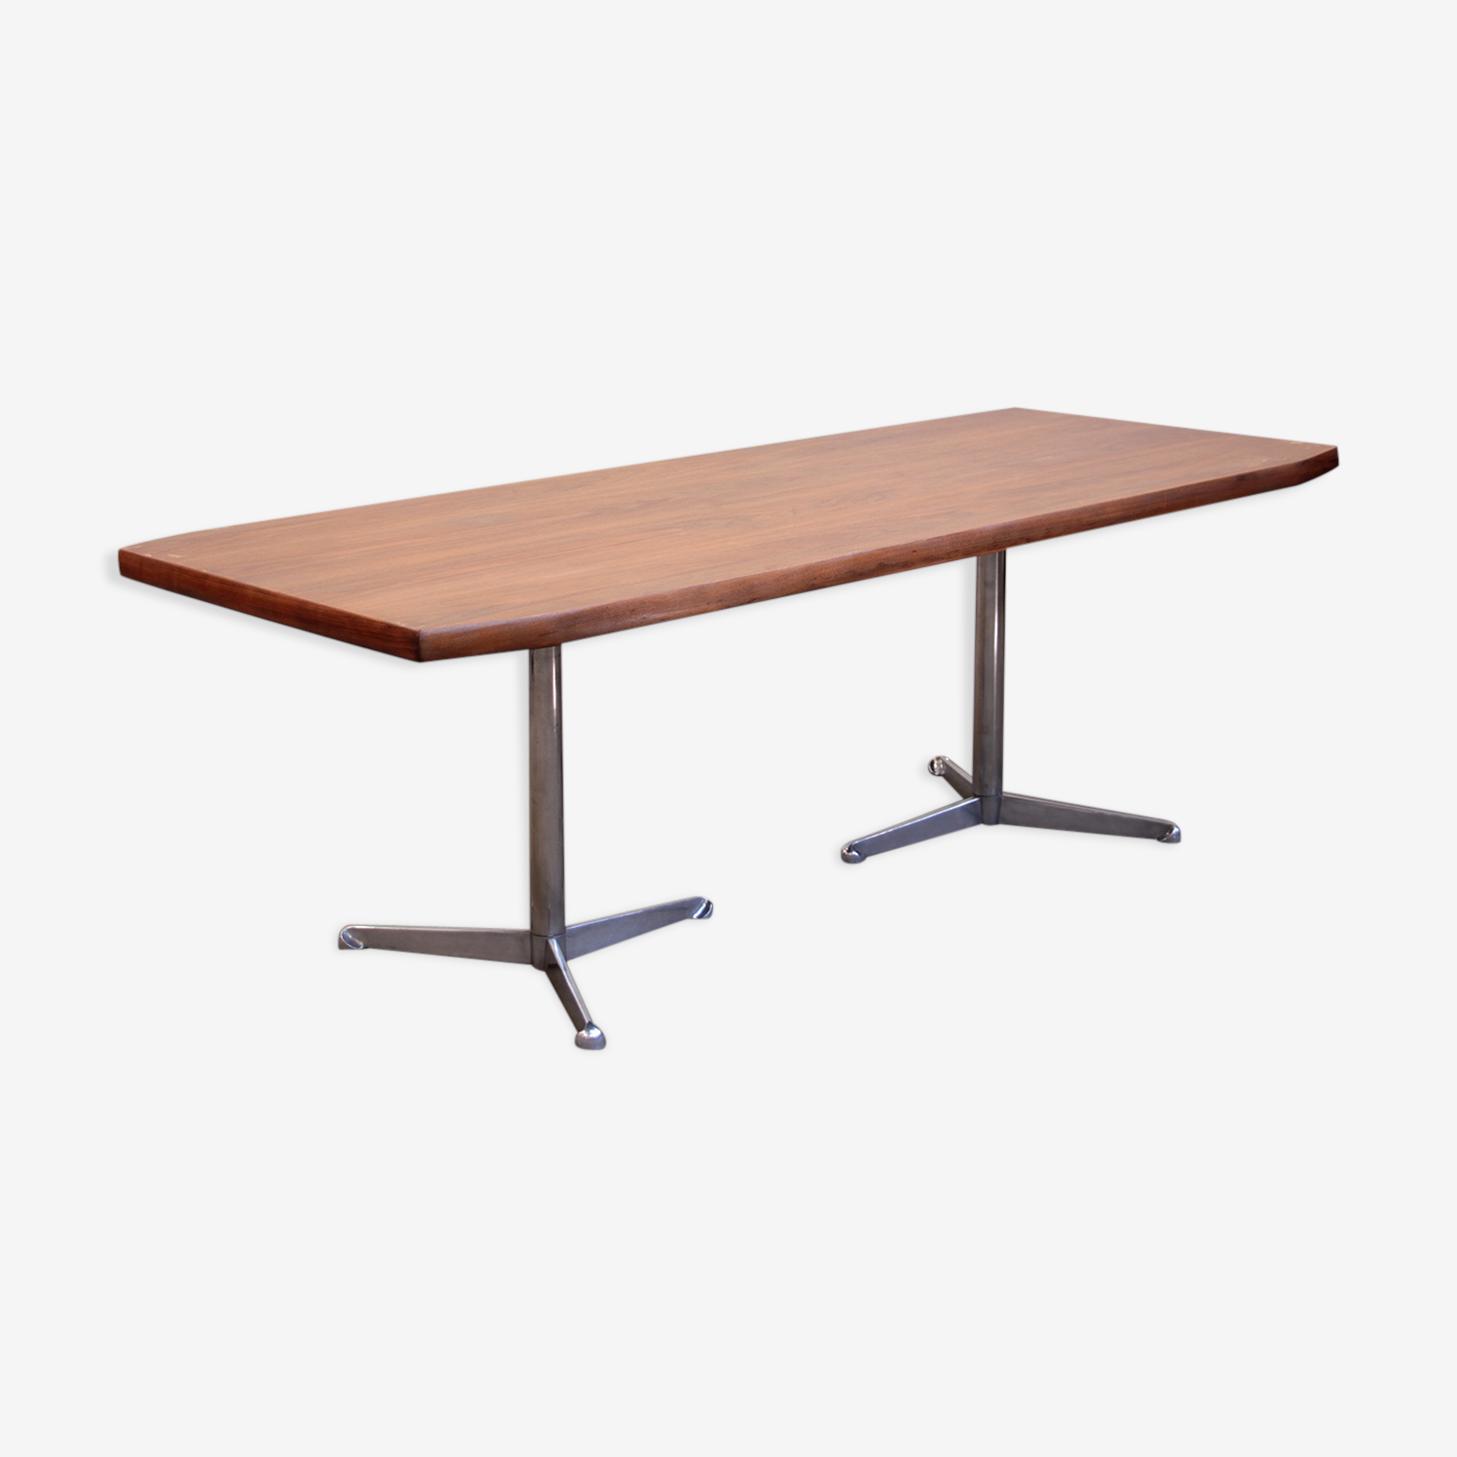 Tecno conference table by Osvaldo Borsani